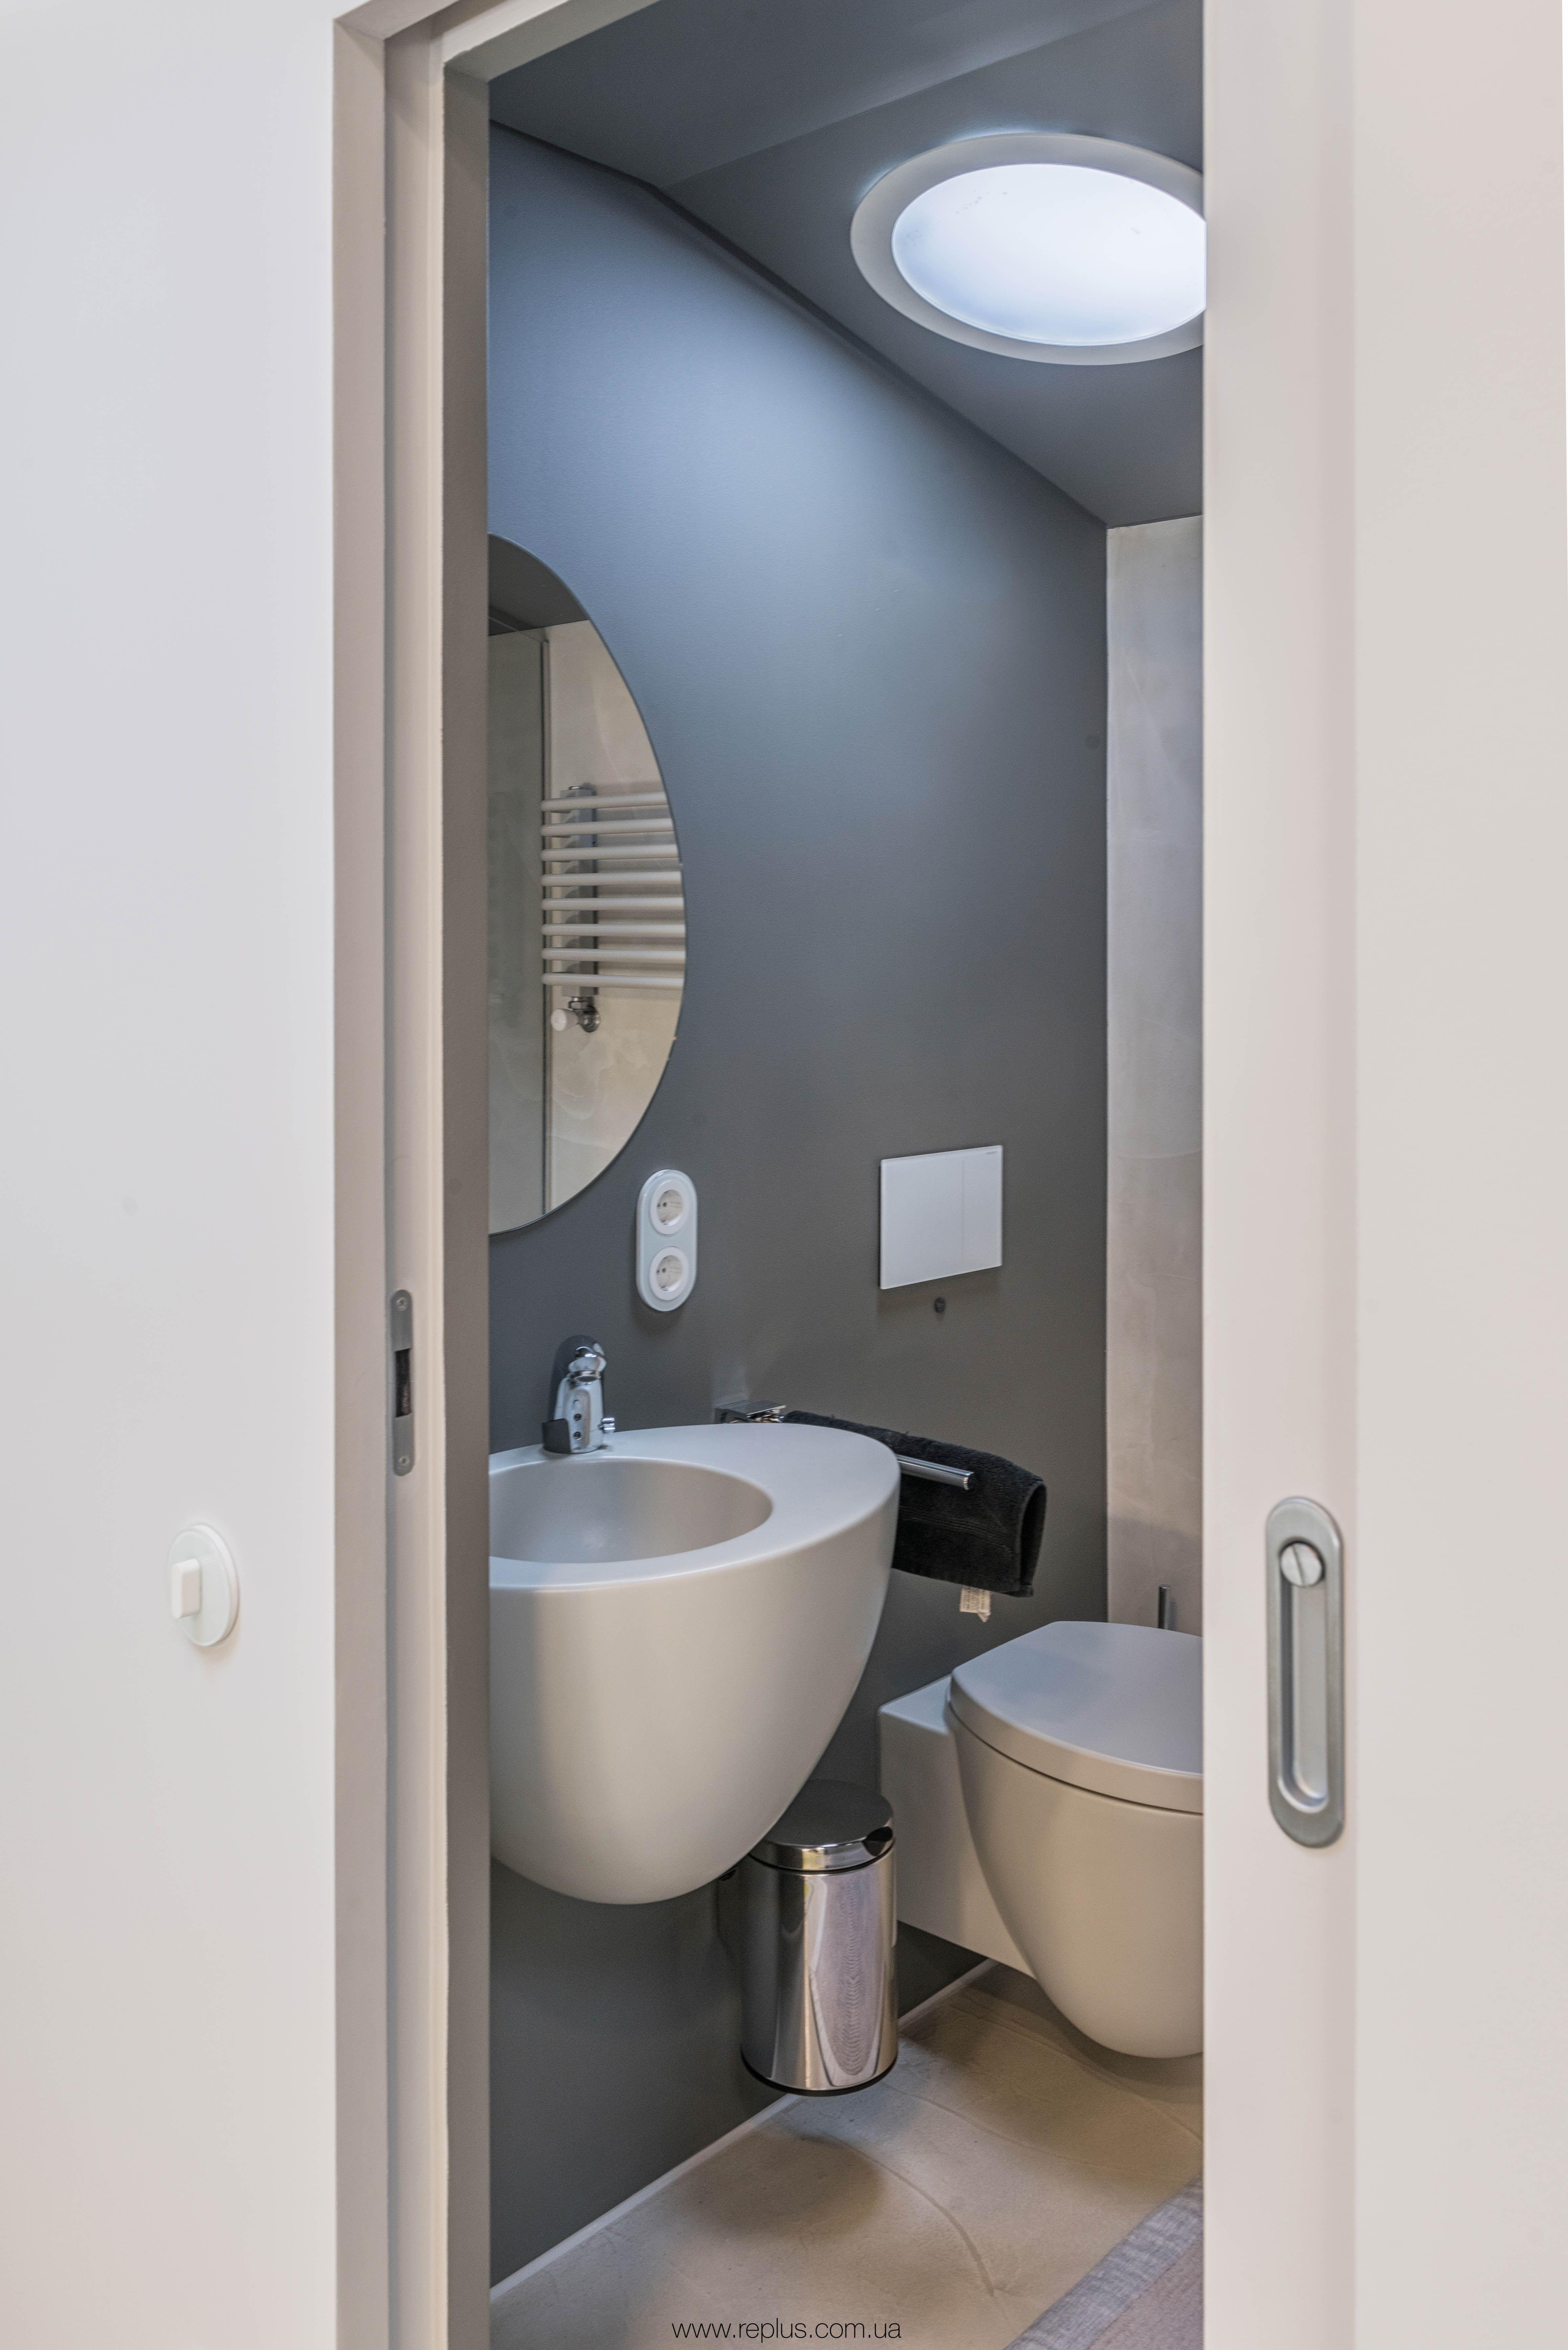 Pin By Petra Freier On Replus Design Bureau Bathroom Decor Bathroom Interior Bathroom Design